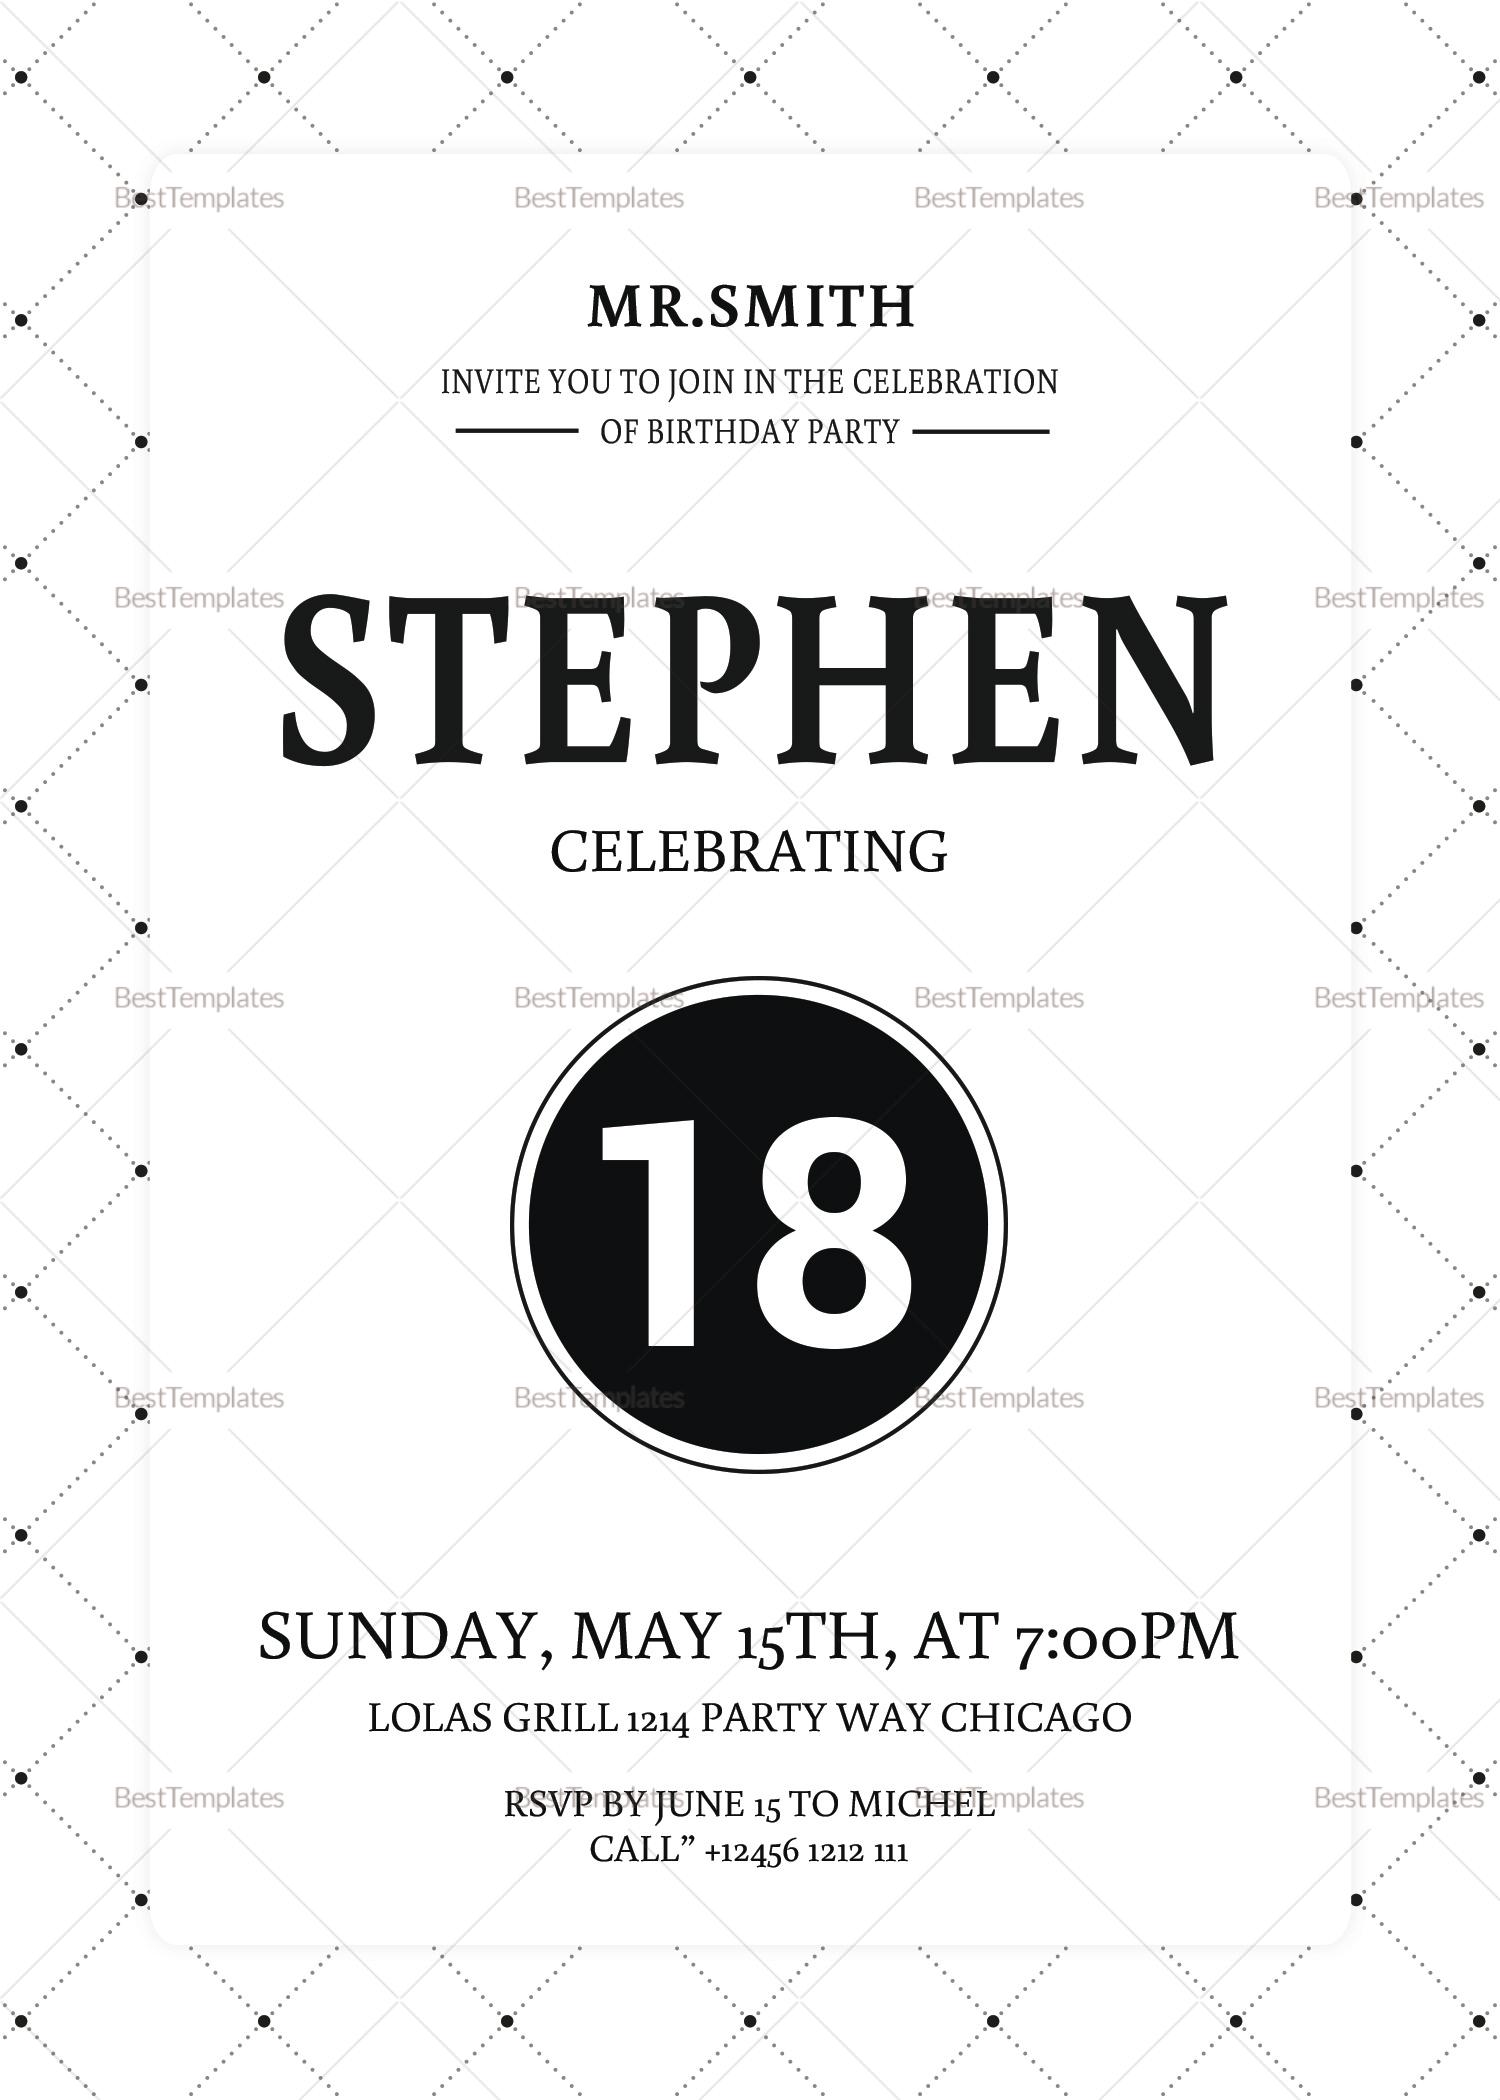 18th birthday party invitation design